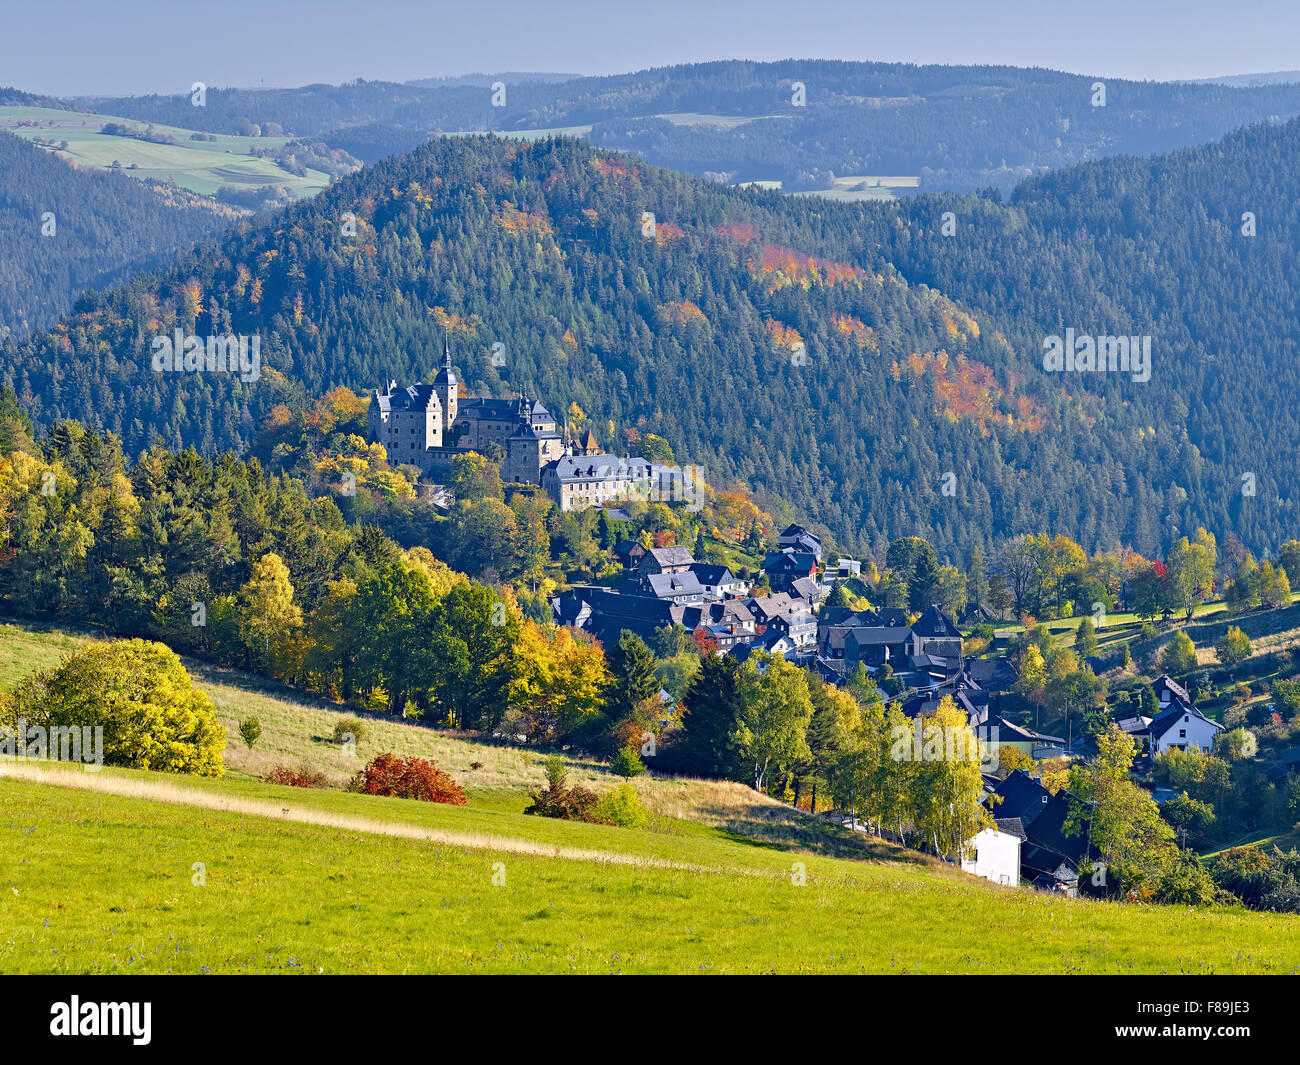 Lauenstein Castle, Ludwigsstadt, Bavaria, Germany - Stock Image